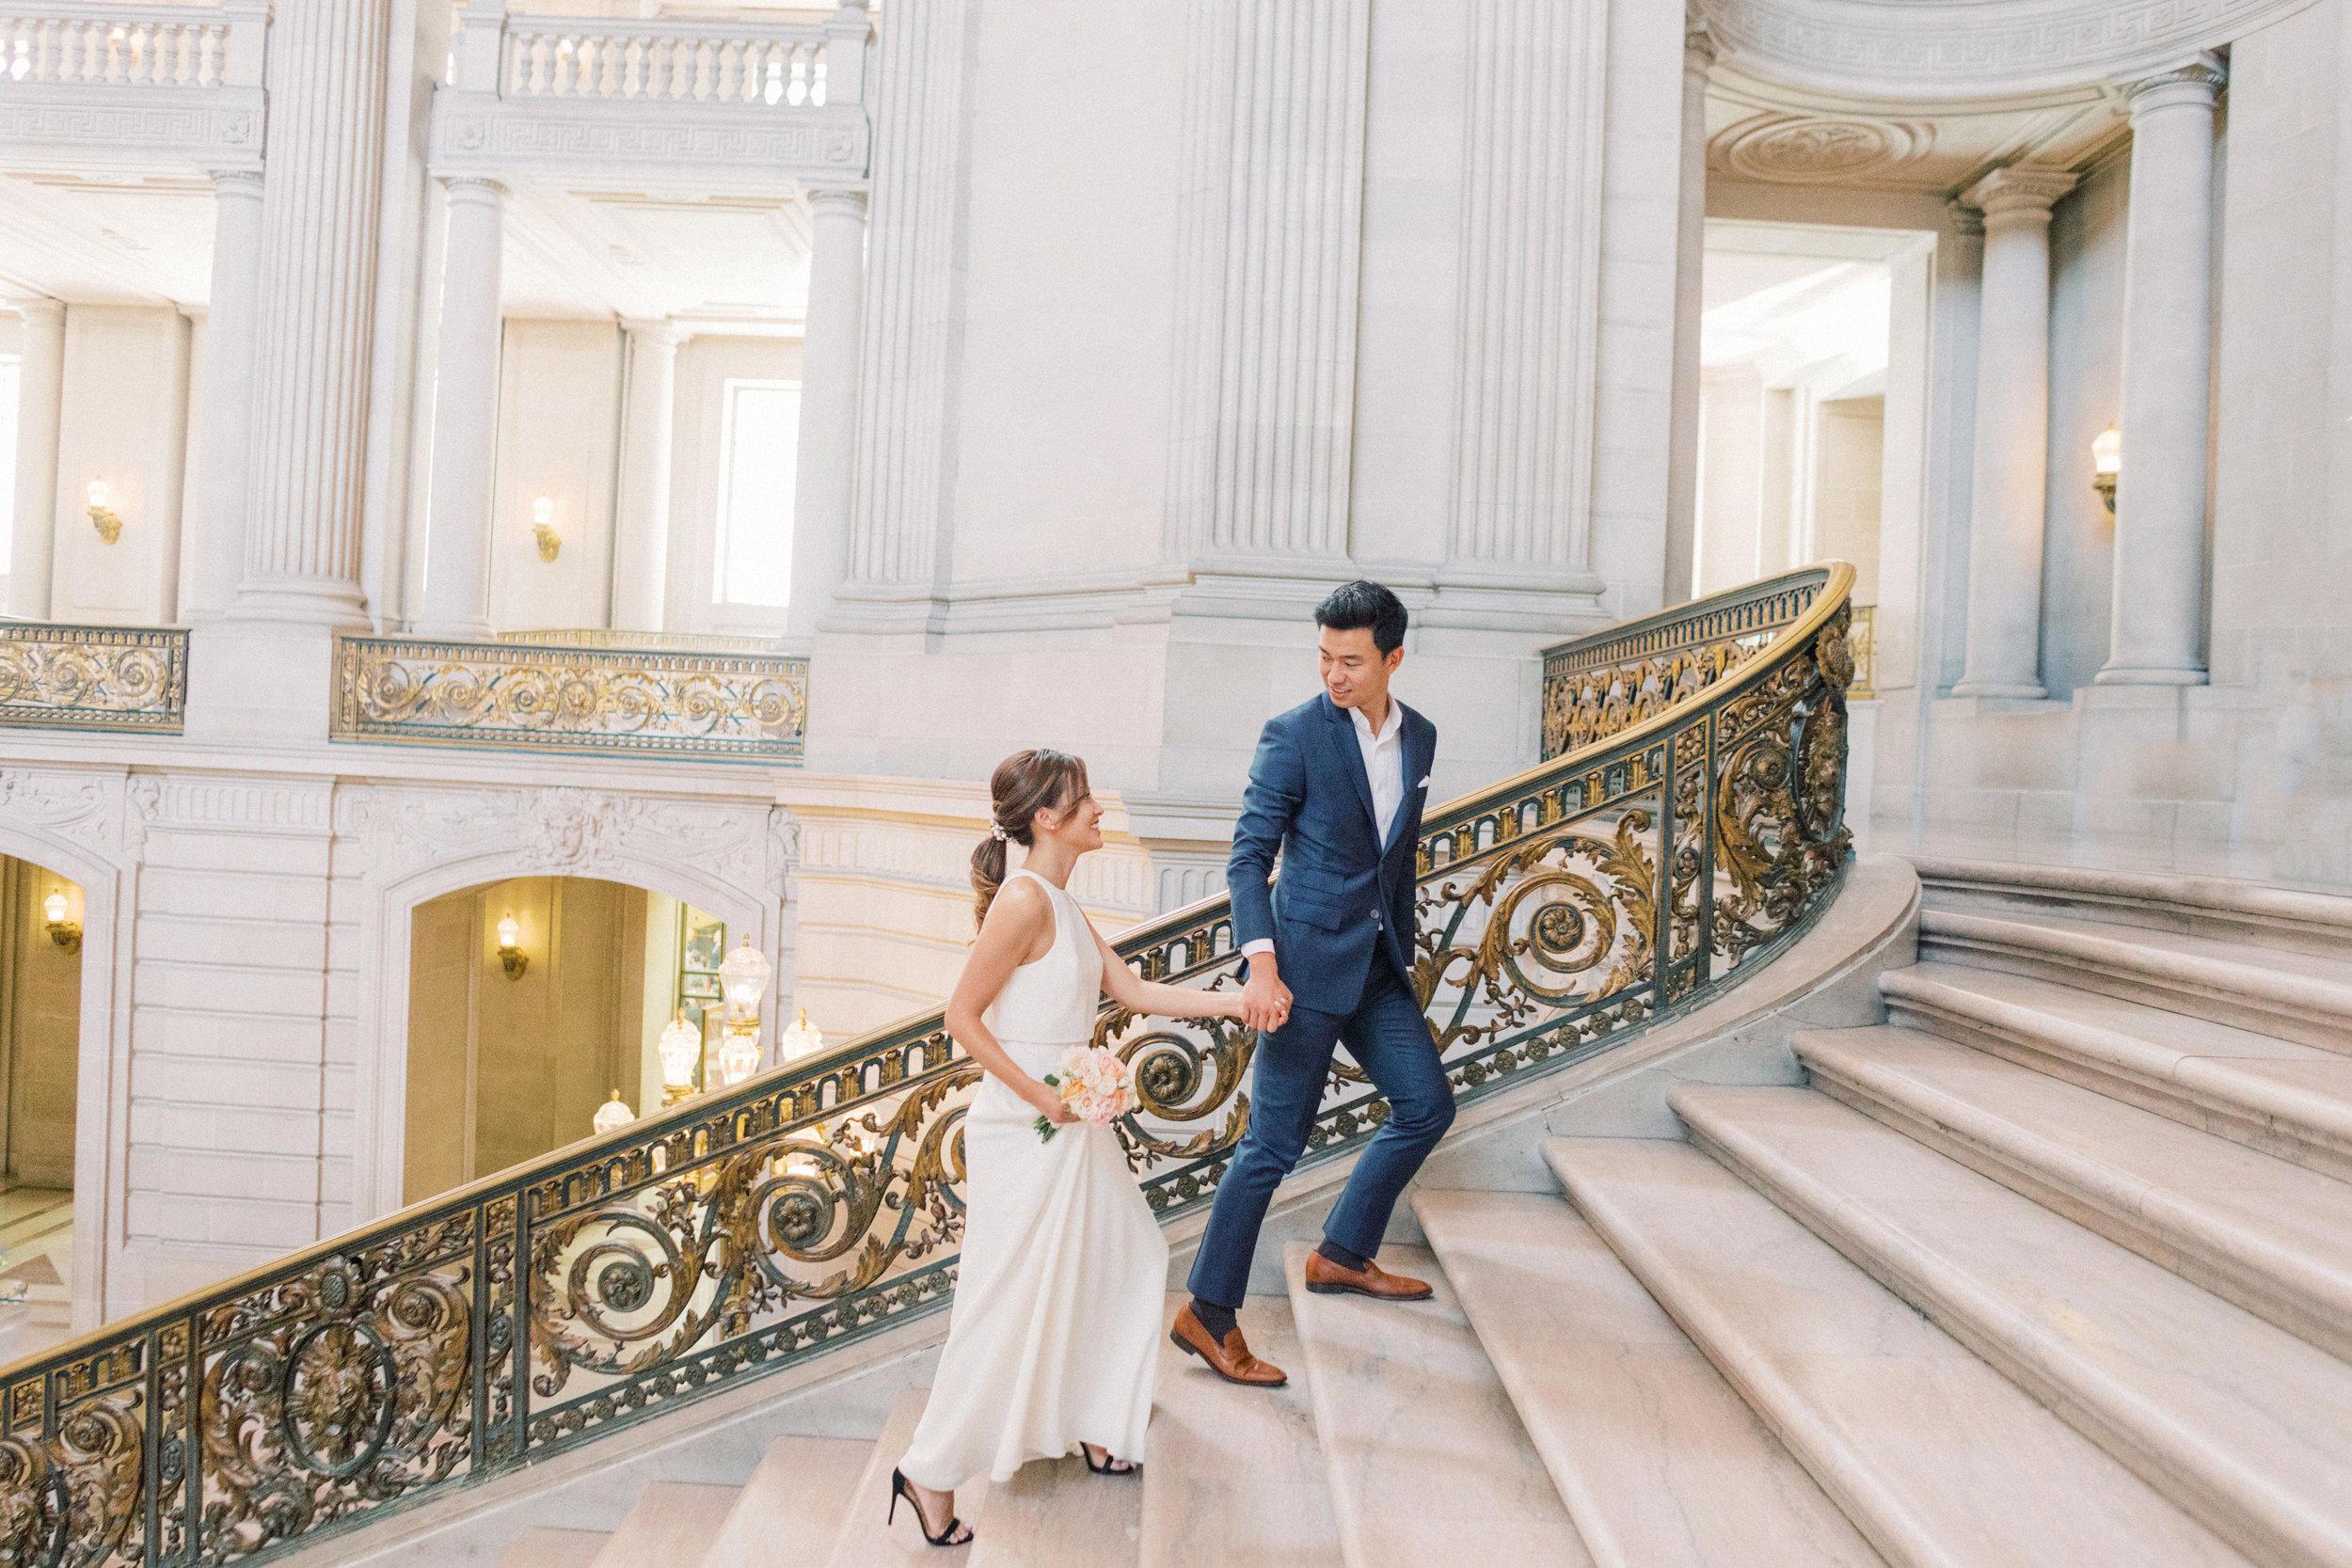 San-francisco-city-hall-photography-wedding-065.jpg